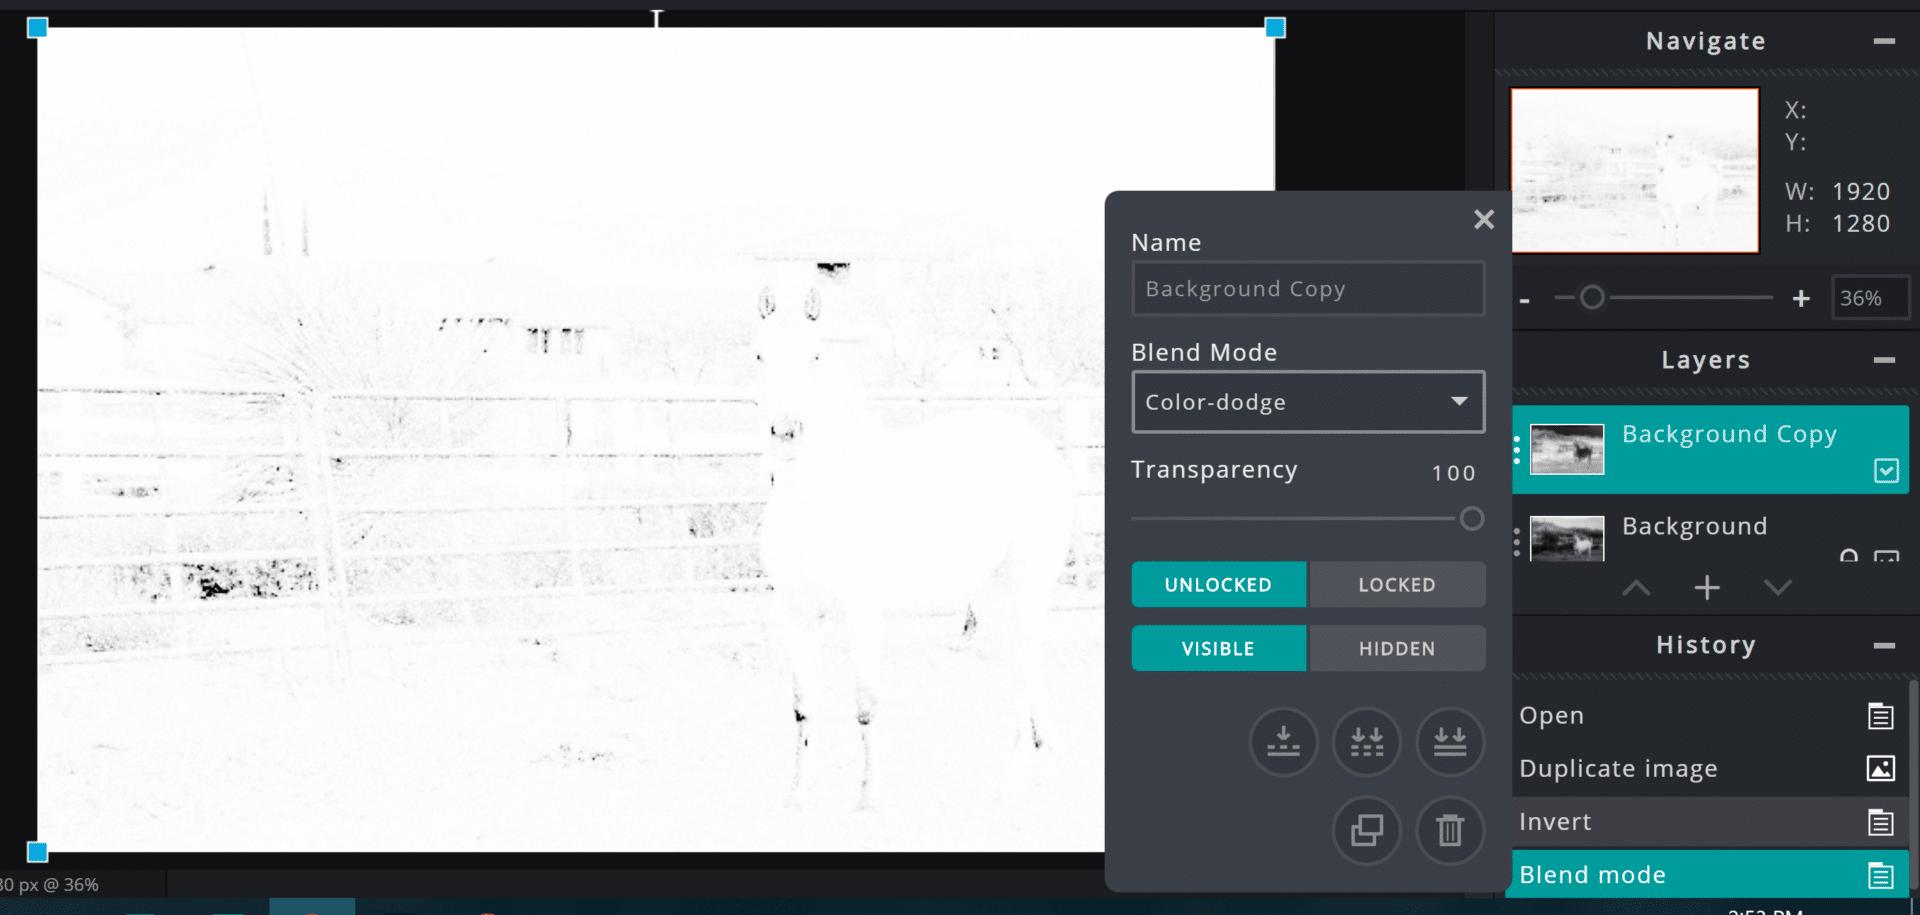 Result of Color-dodge in Pixlr E